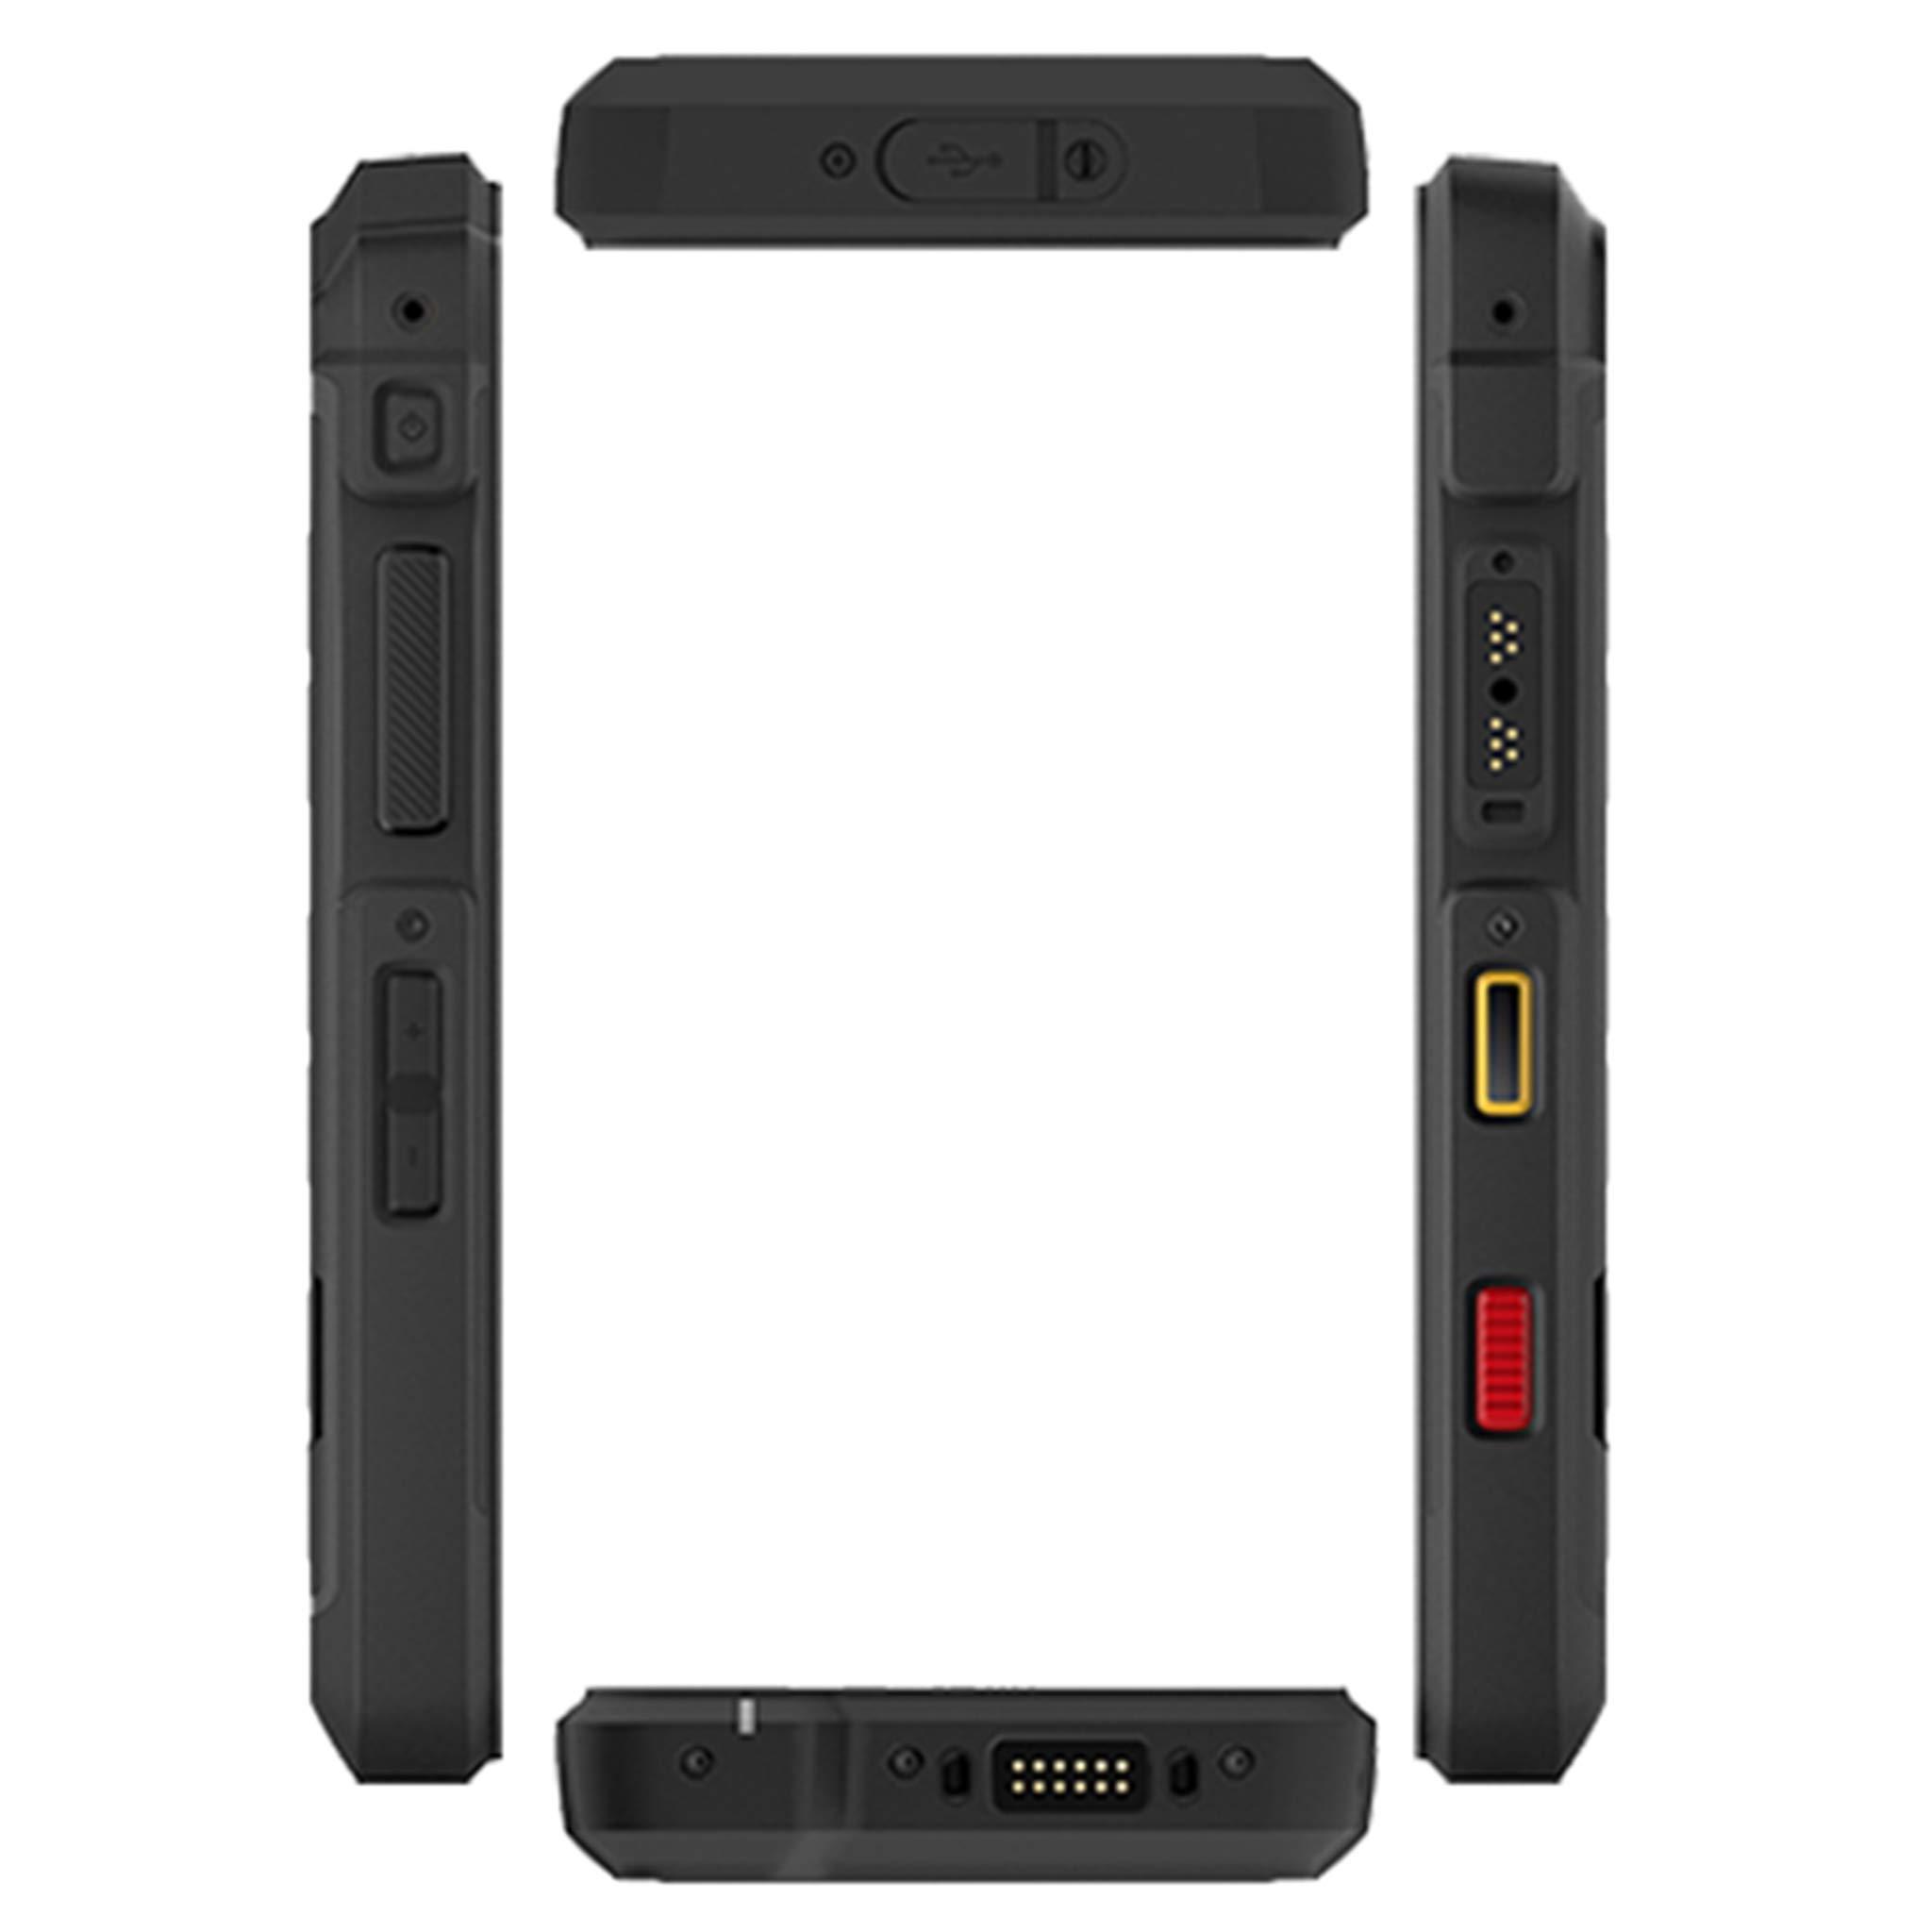 Sonim XP8 XP8800 Dual-SIM 64GB IP68/IP69 (GSM Only, No CDMA) Factory Unlocked 4G/LTE Rugged Smartphone (Black) - International Version